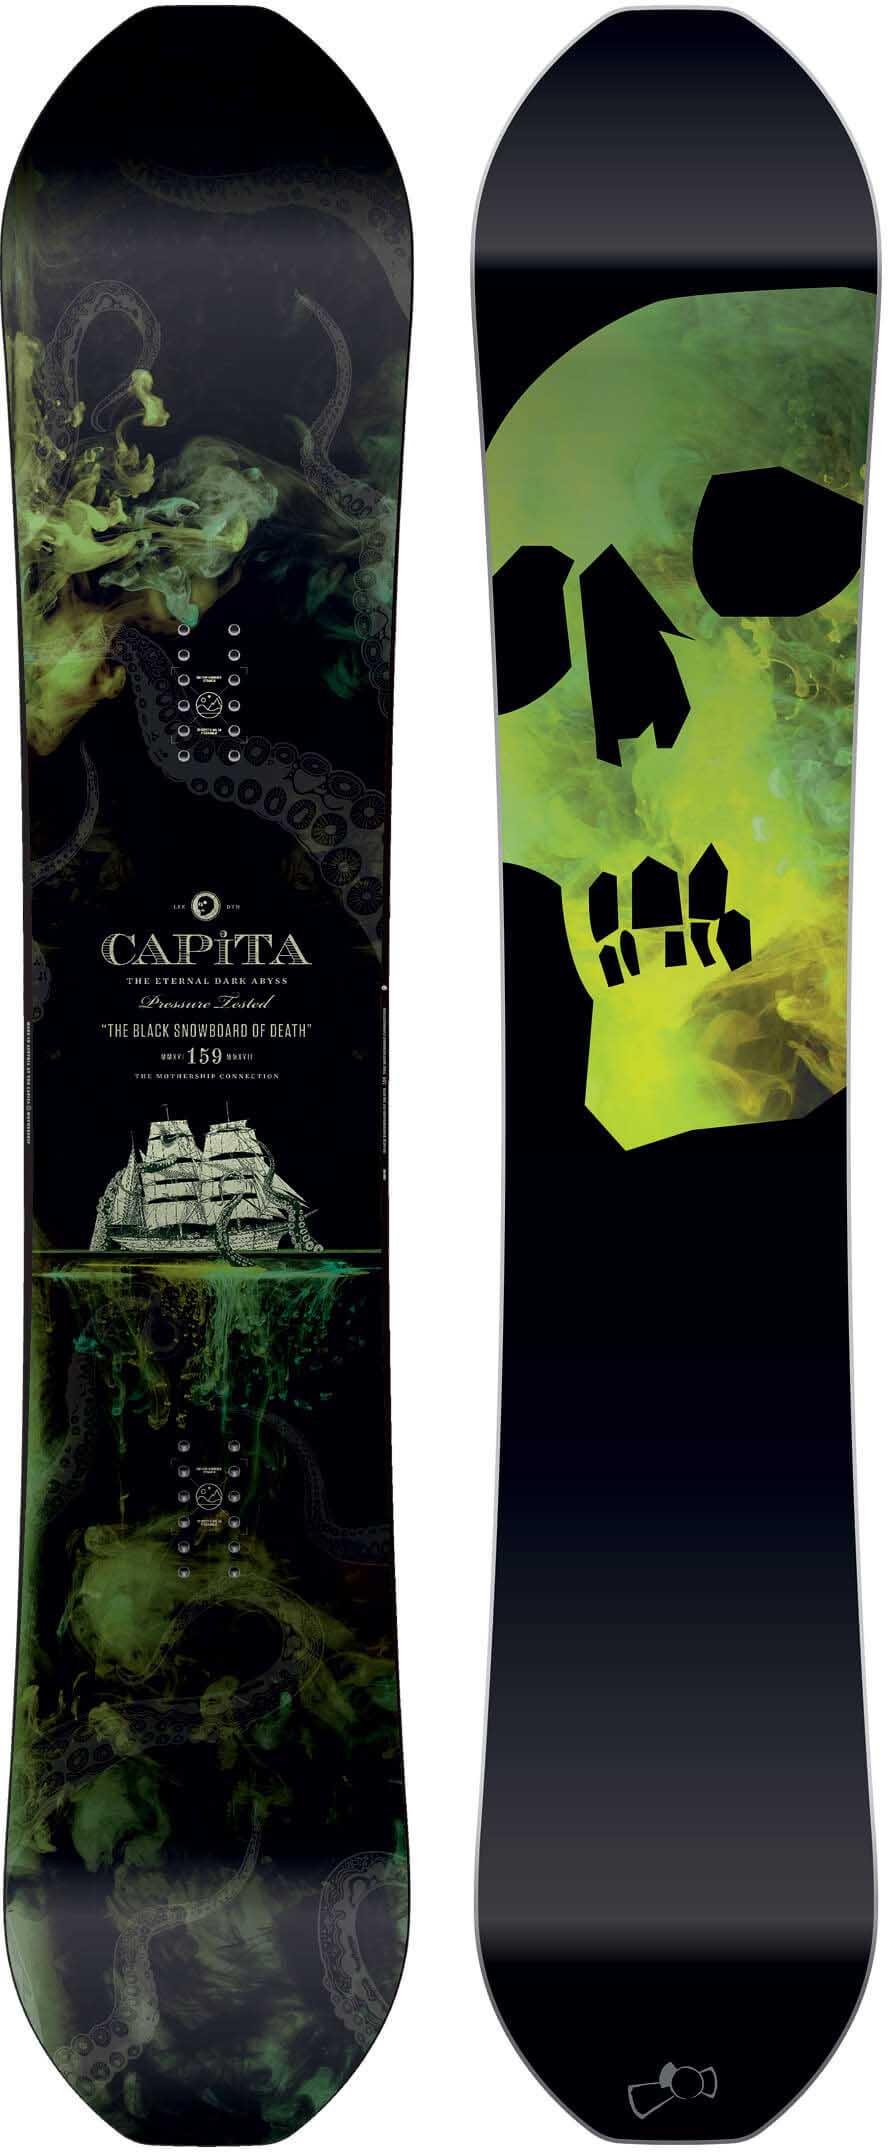 Amazon.com : capita black snowboard of death snowboards ...